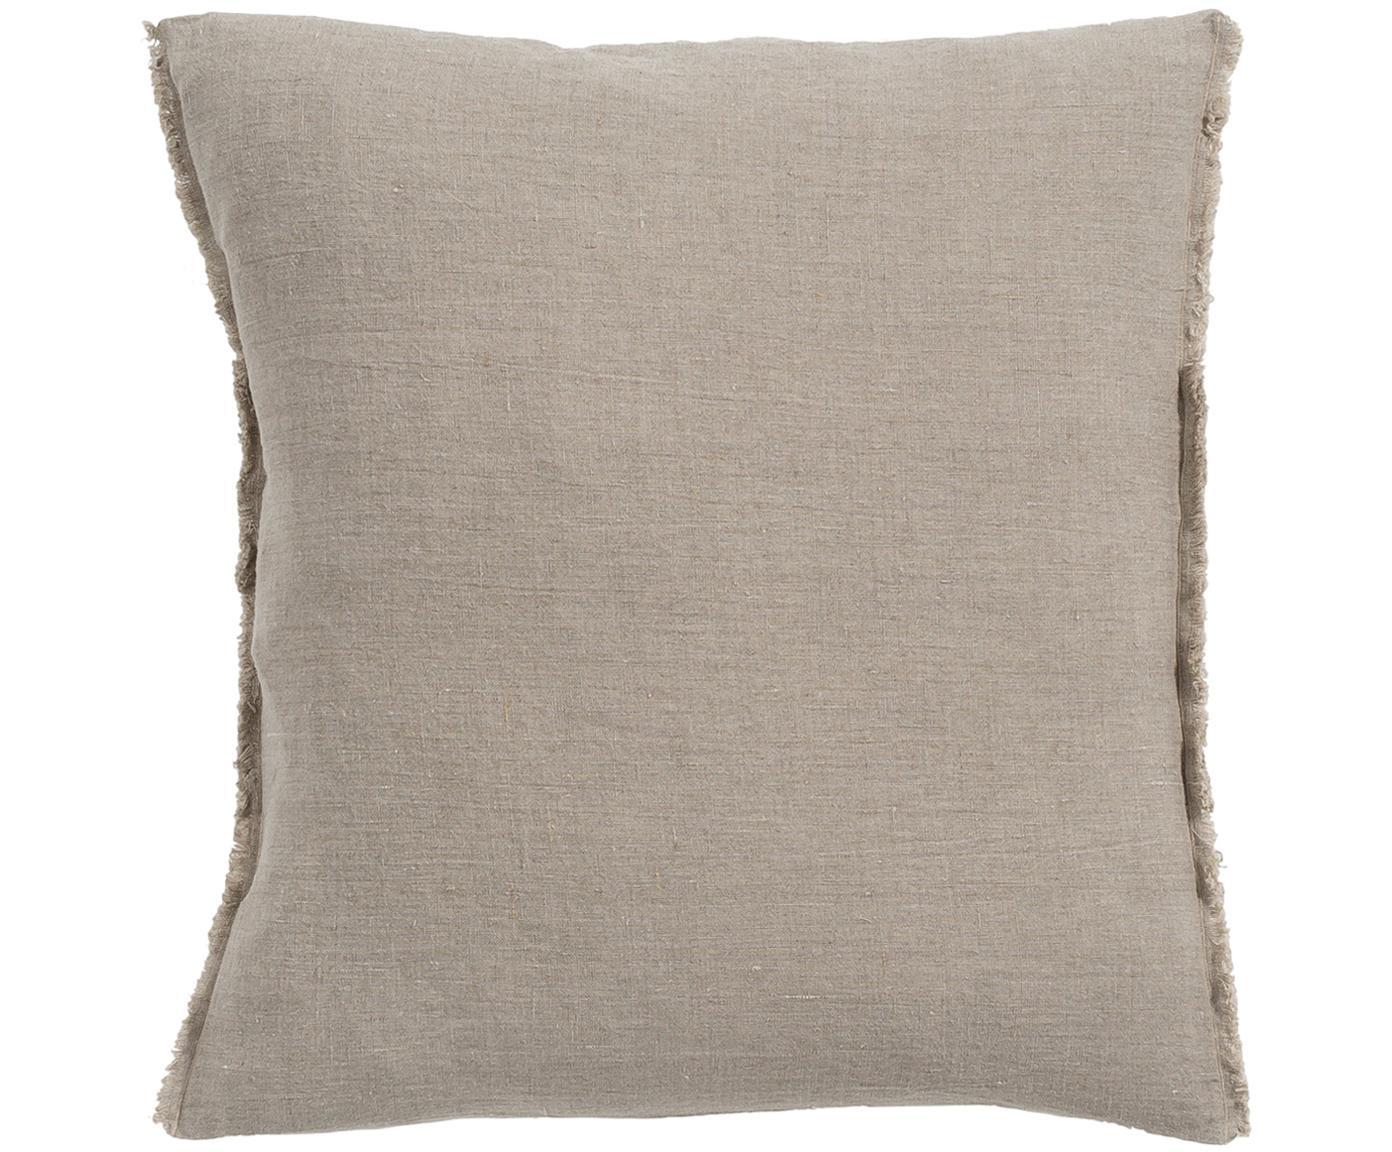 Cuscino in lino con imbottitura Sunshine Fringe, Taupe, Larg. 50 x Lung. 50 cm